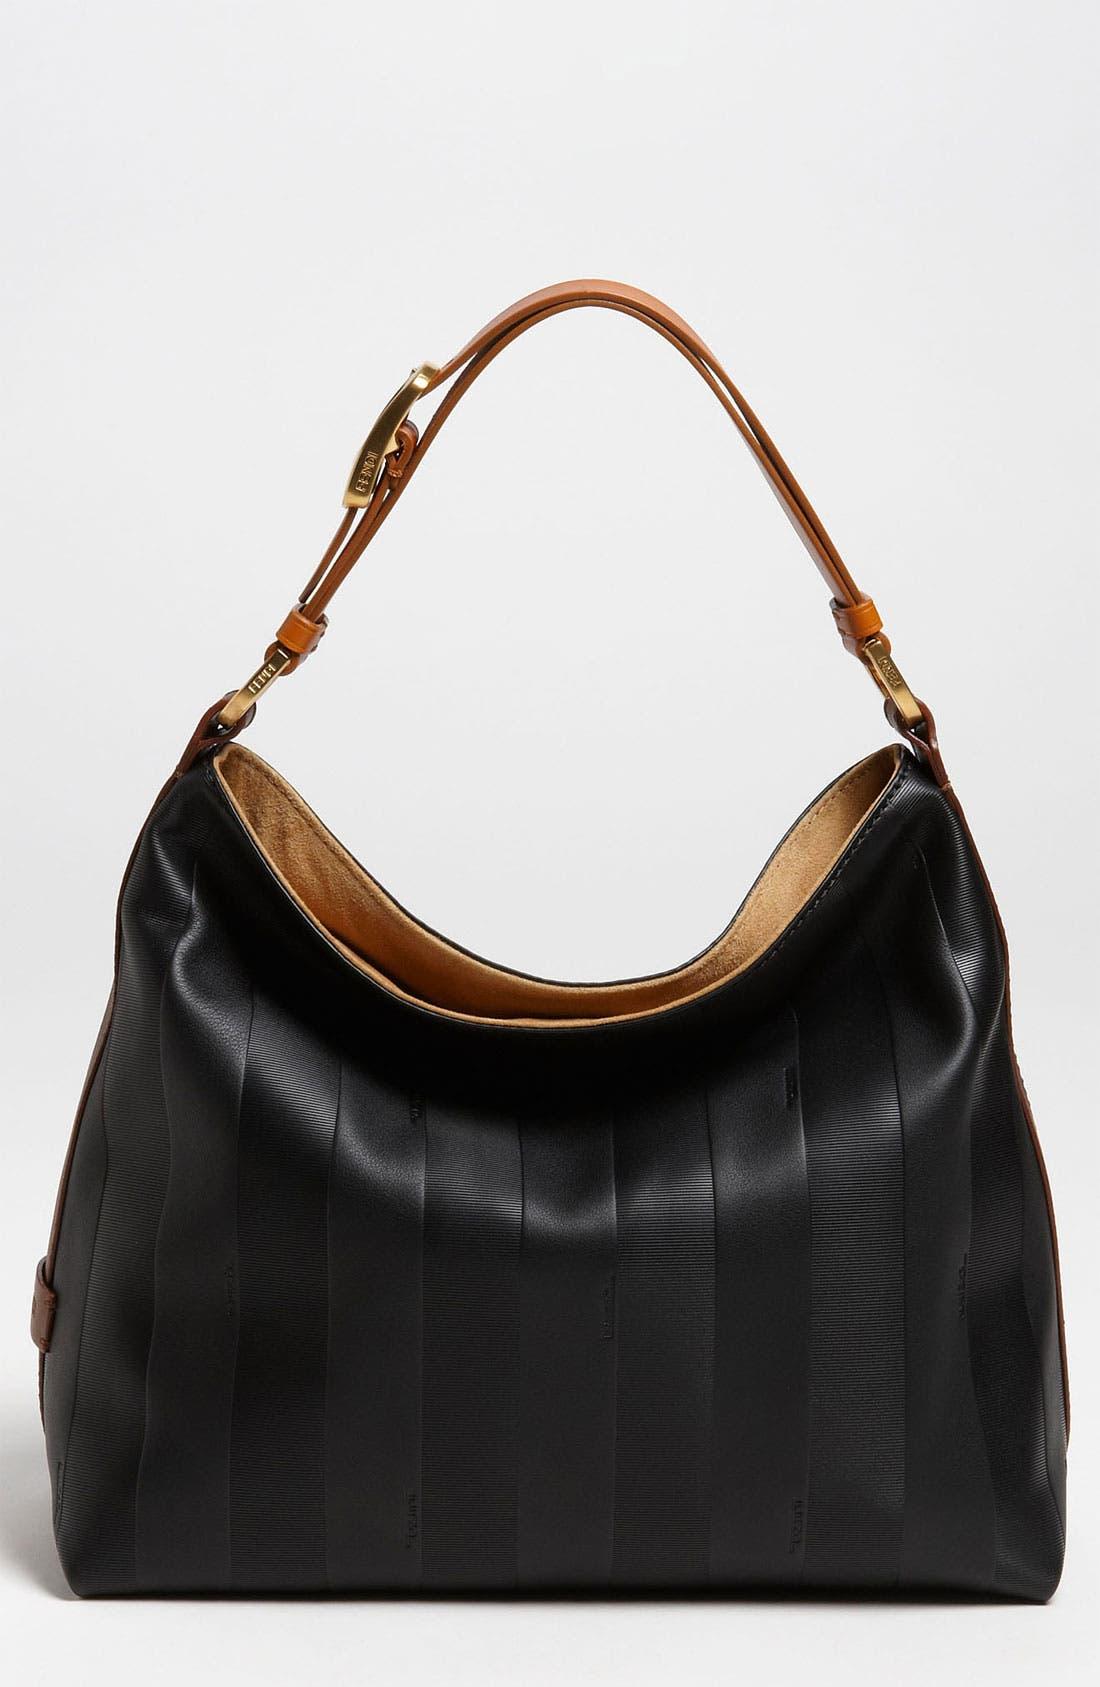 Main Image - Fendi 'Paris Pequin - Small' Leather Hobo